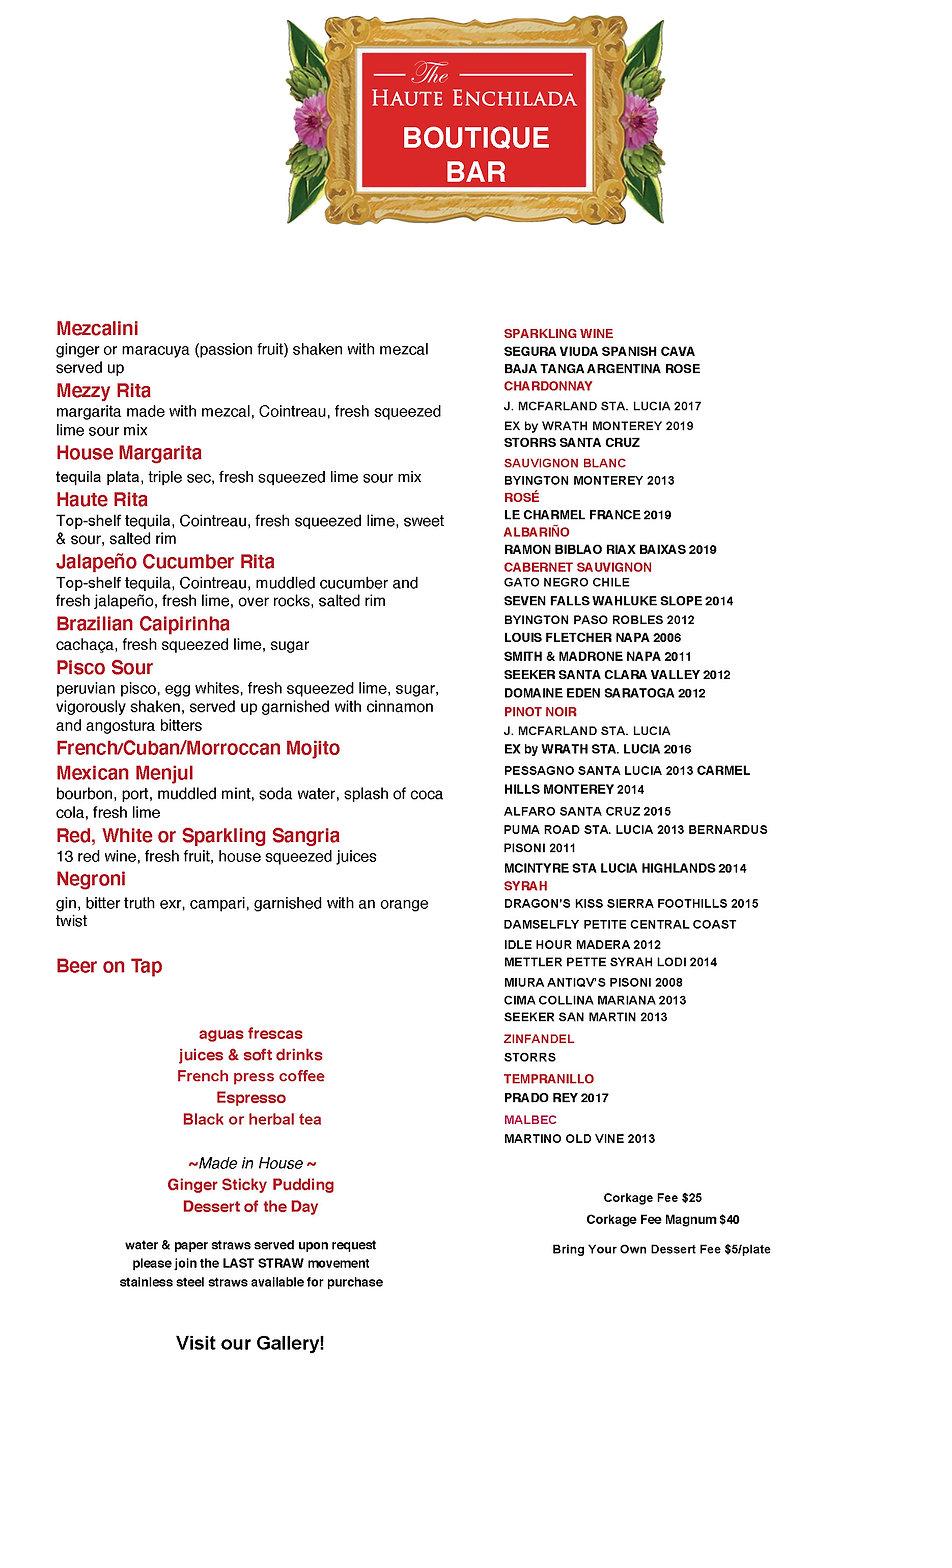 Bar menu 8_26_21_noprices_.jpg